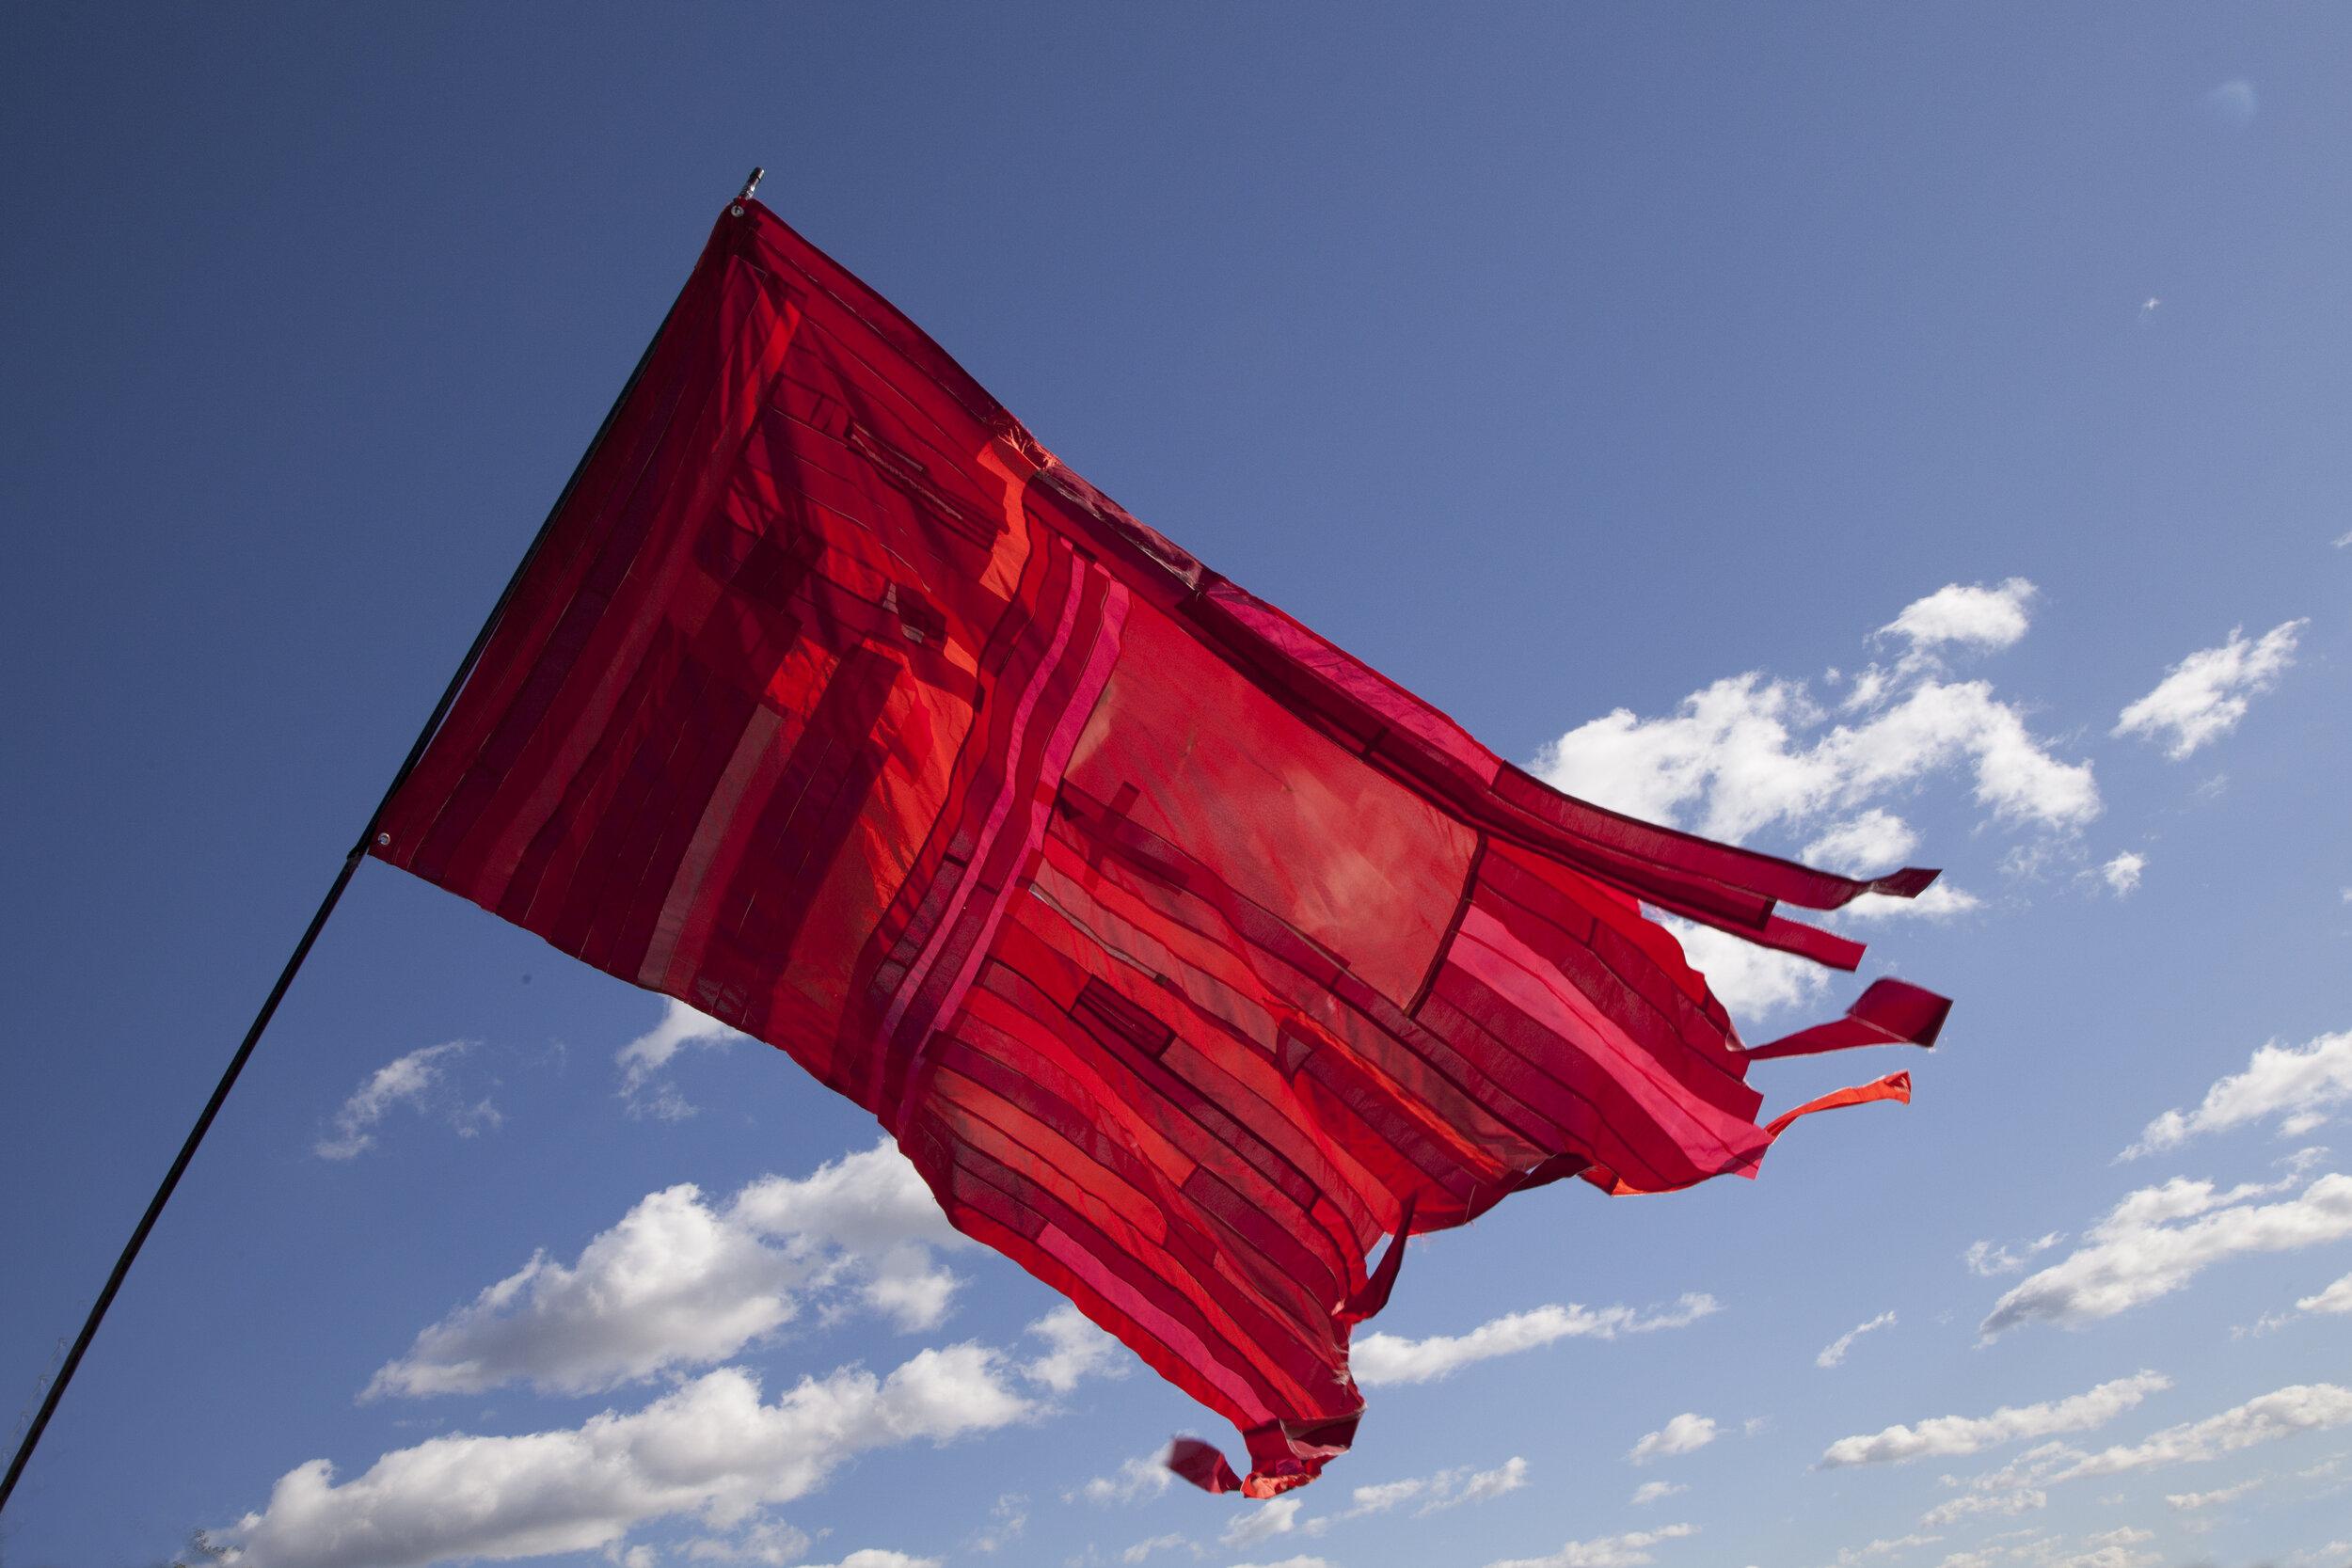 warningflag.jpg